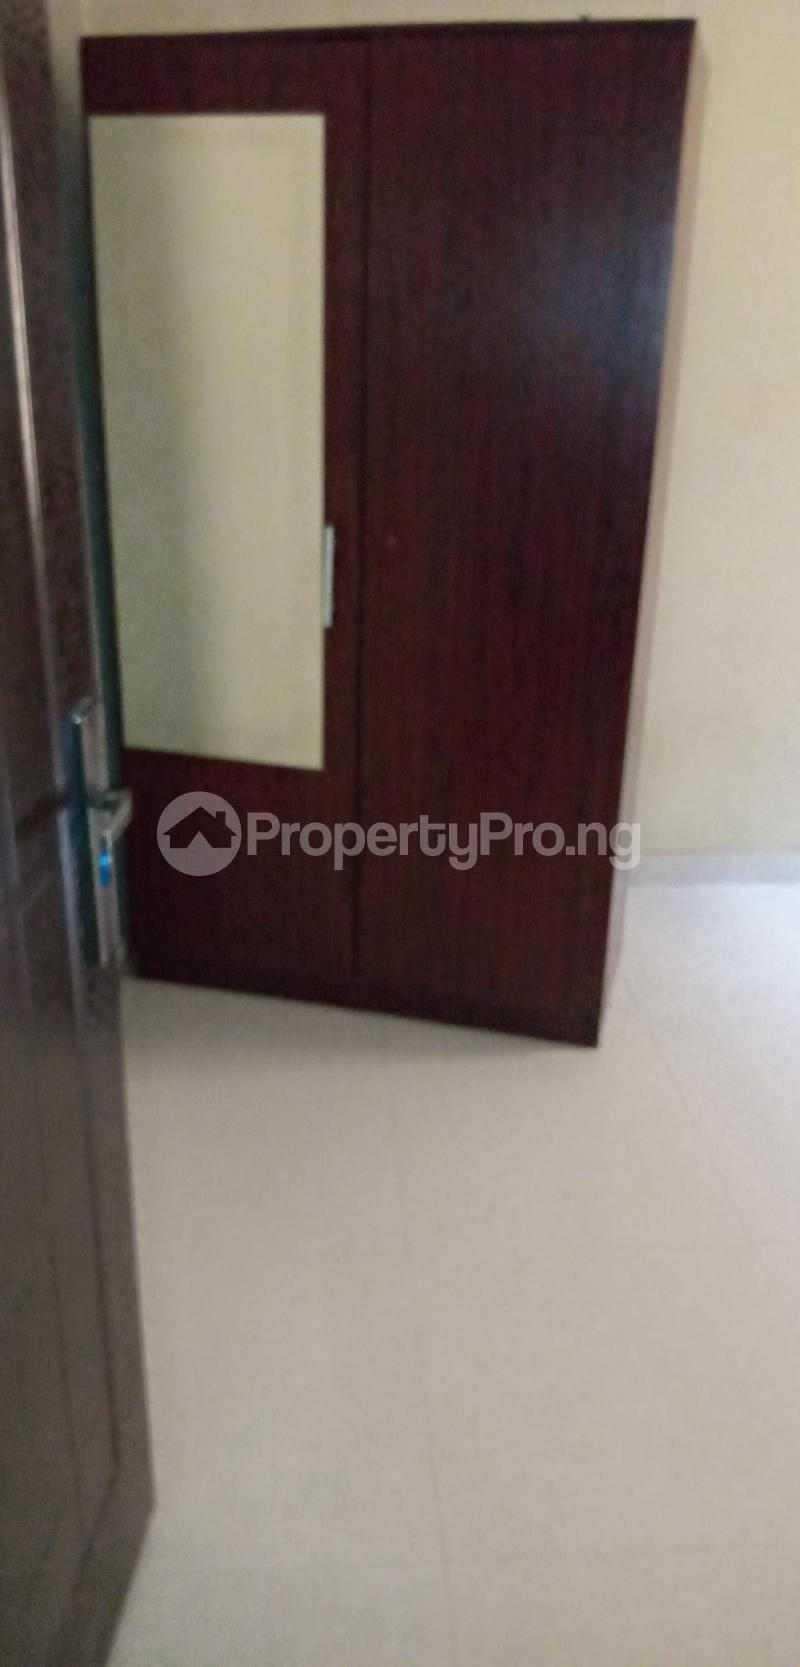 2 bedroom Flat / Apartment for rent Badore Ajah Lagos - 3